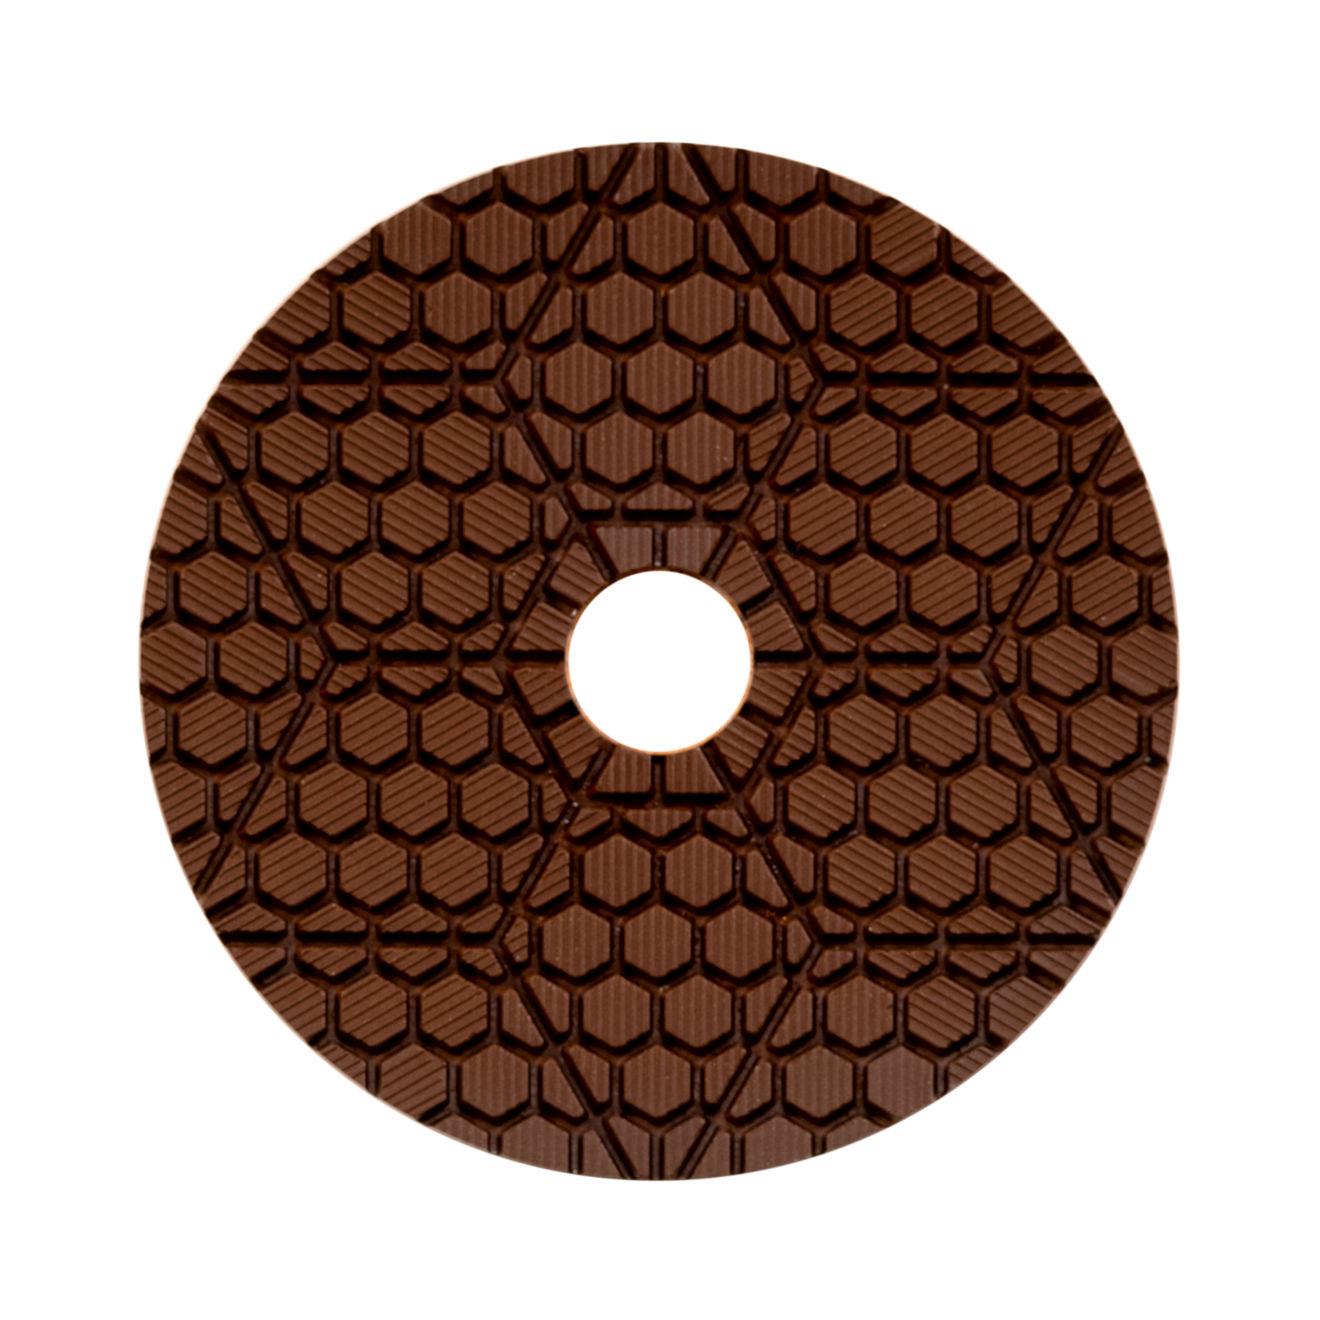 "ODYN Premium Wet Stone Polishing Pad 4"" x 5/8"" - 400 Grit"